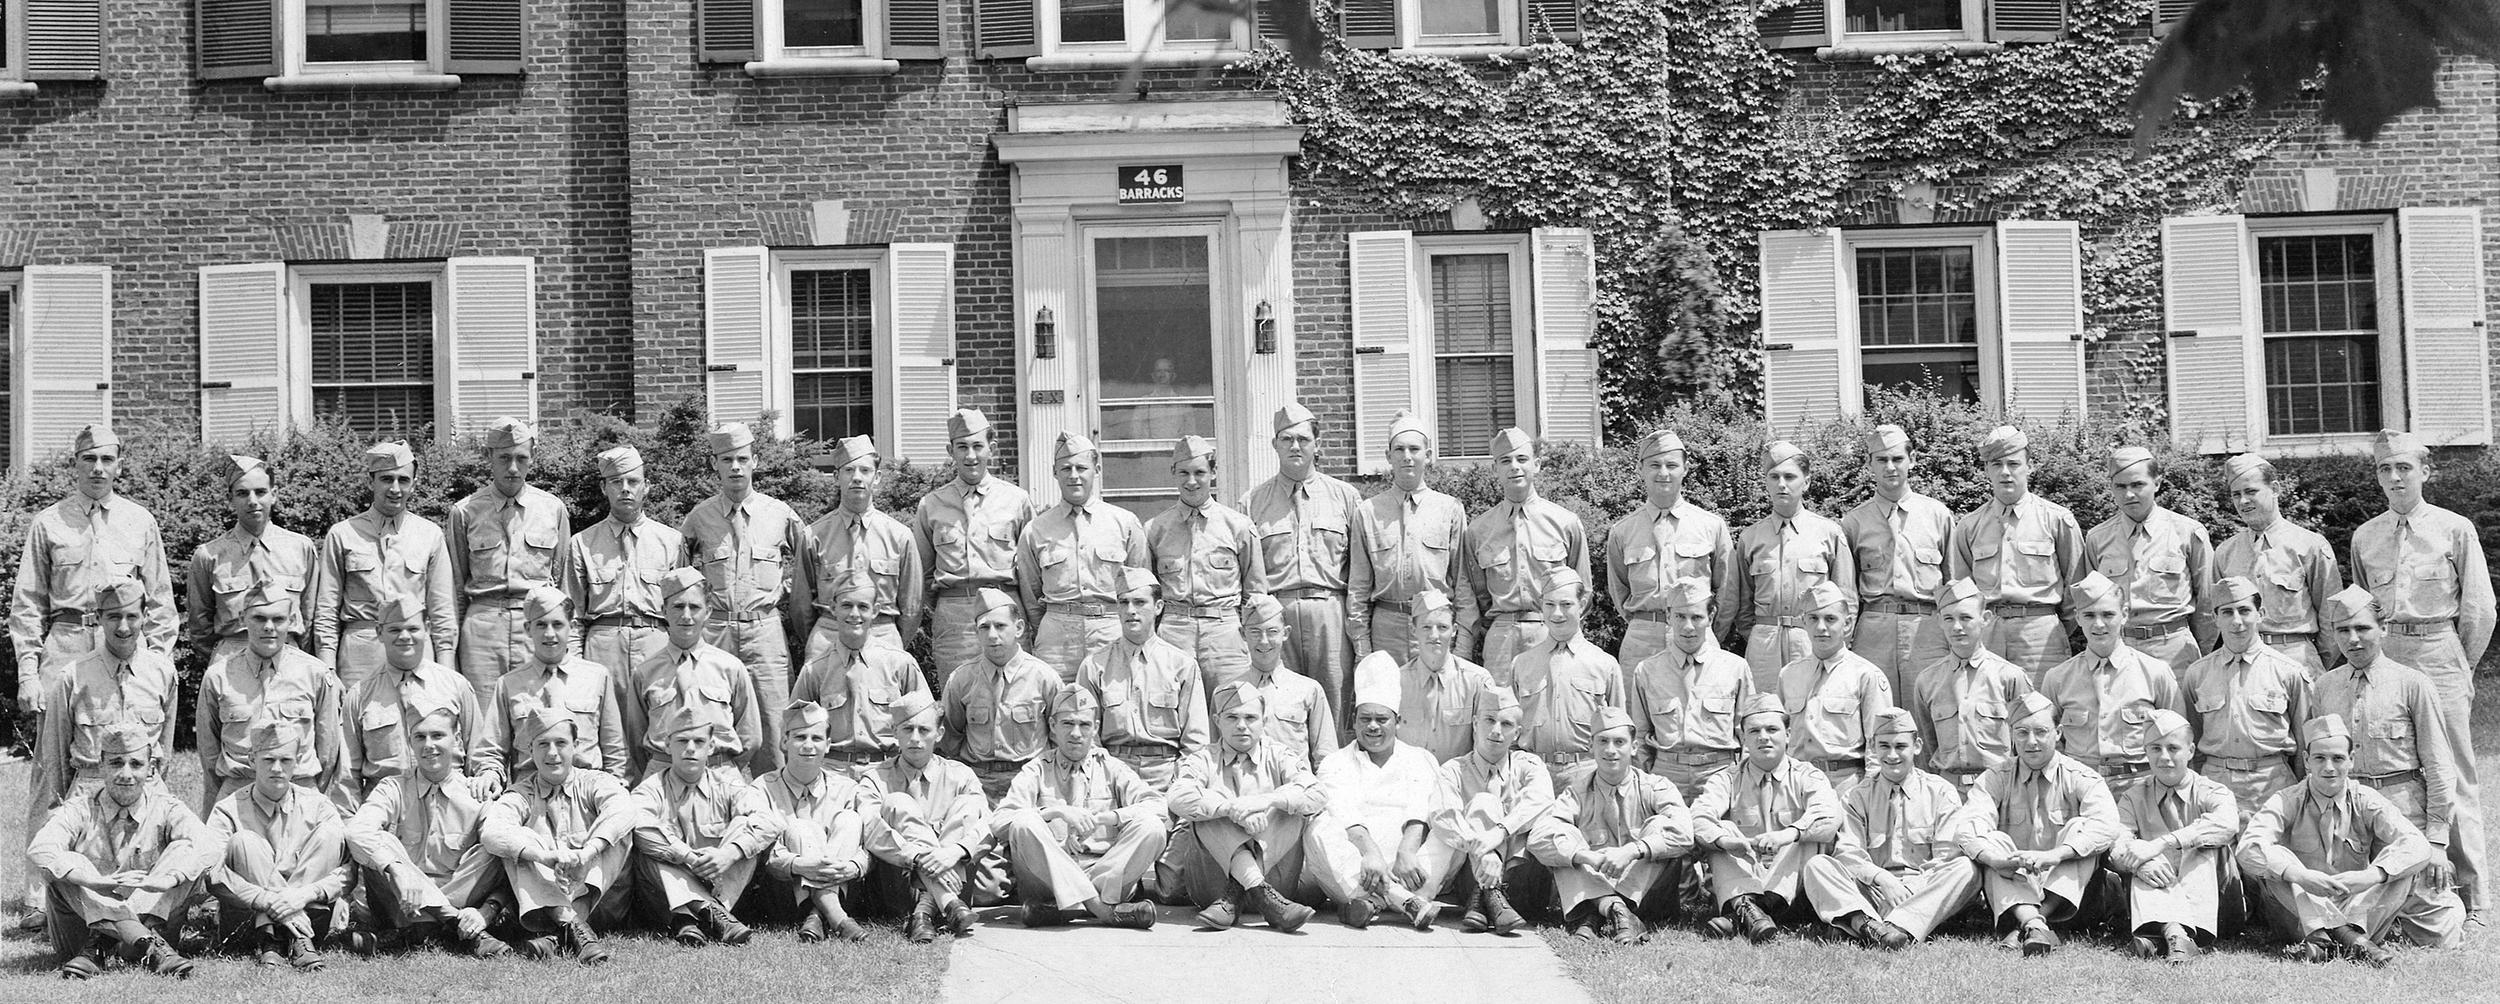 523 South Allen St.used as a Amry Barracks - Barracks 46 -circa 1940's